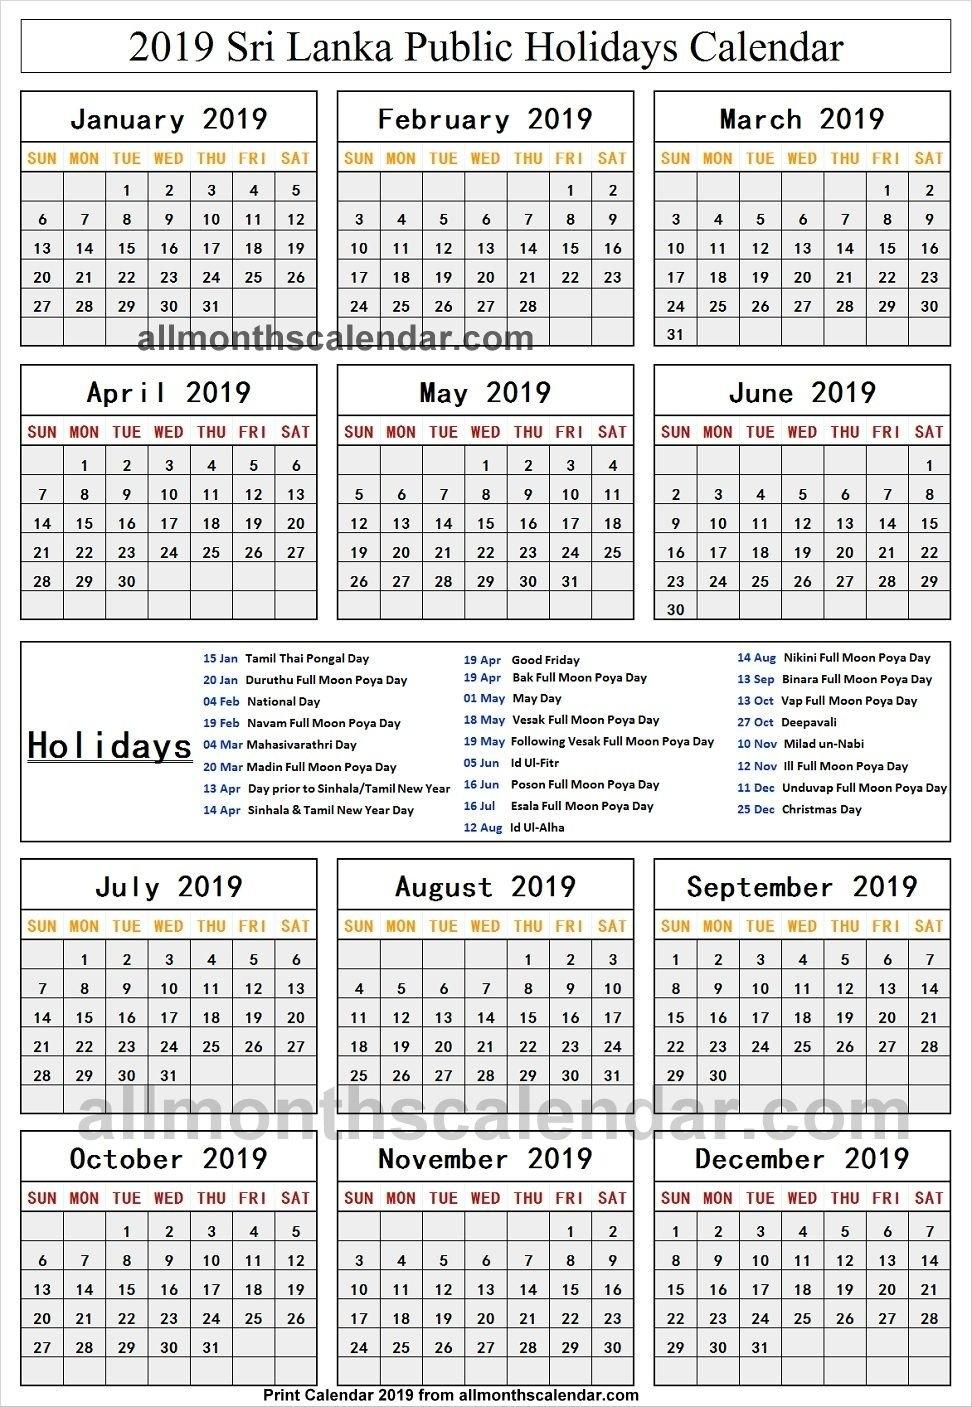 Sri Lanka Holiday List 2019 | Holidays Calendar 2019 | Holiday Calendar 2019 List Of Holidays